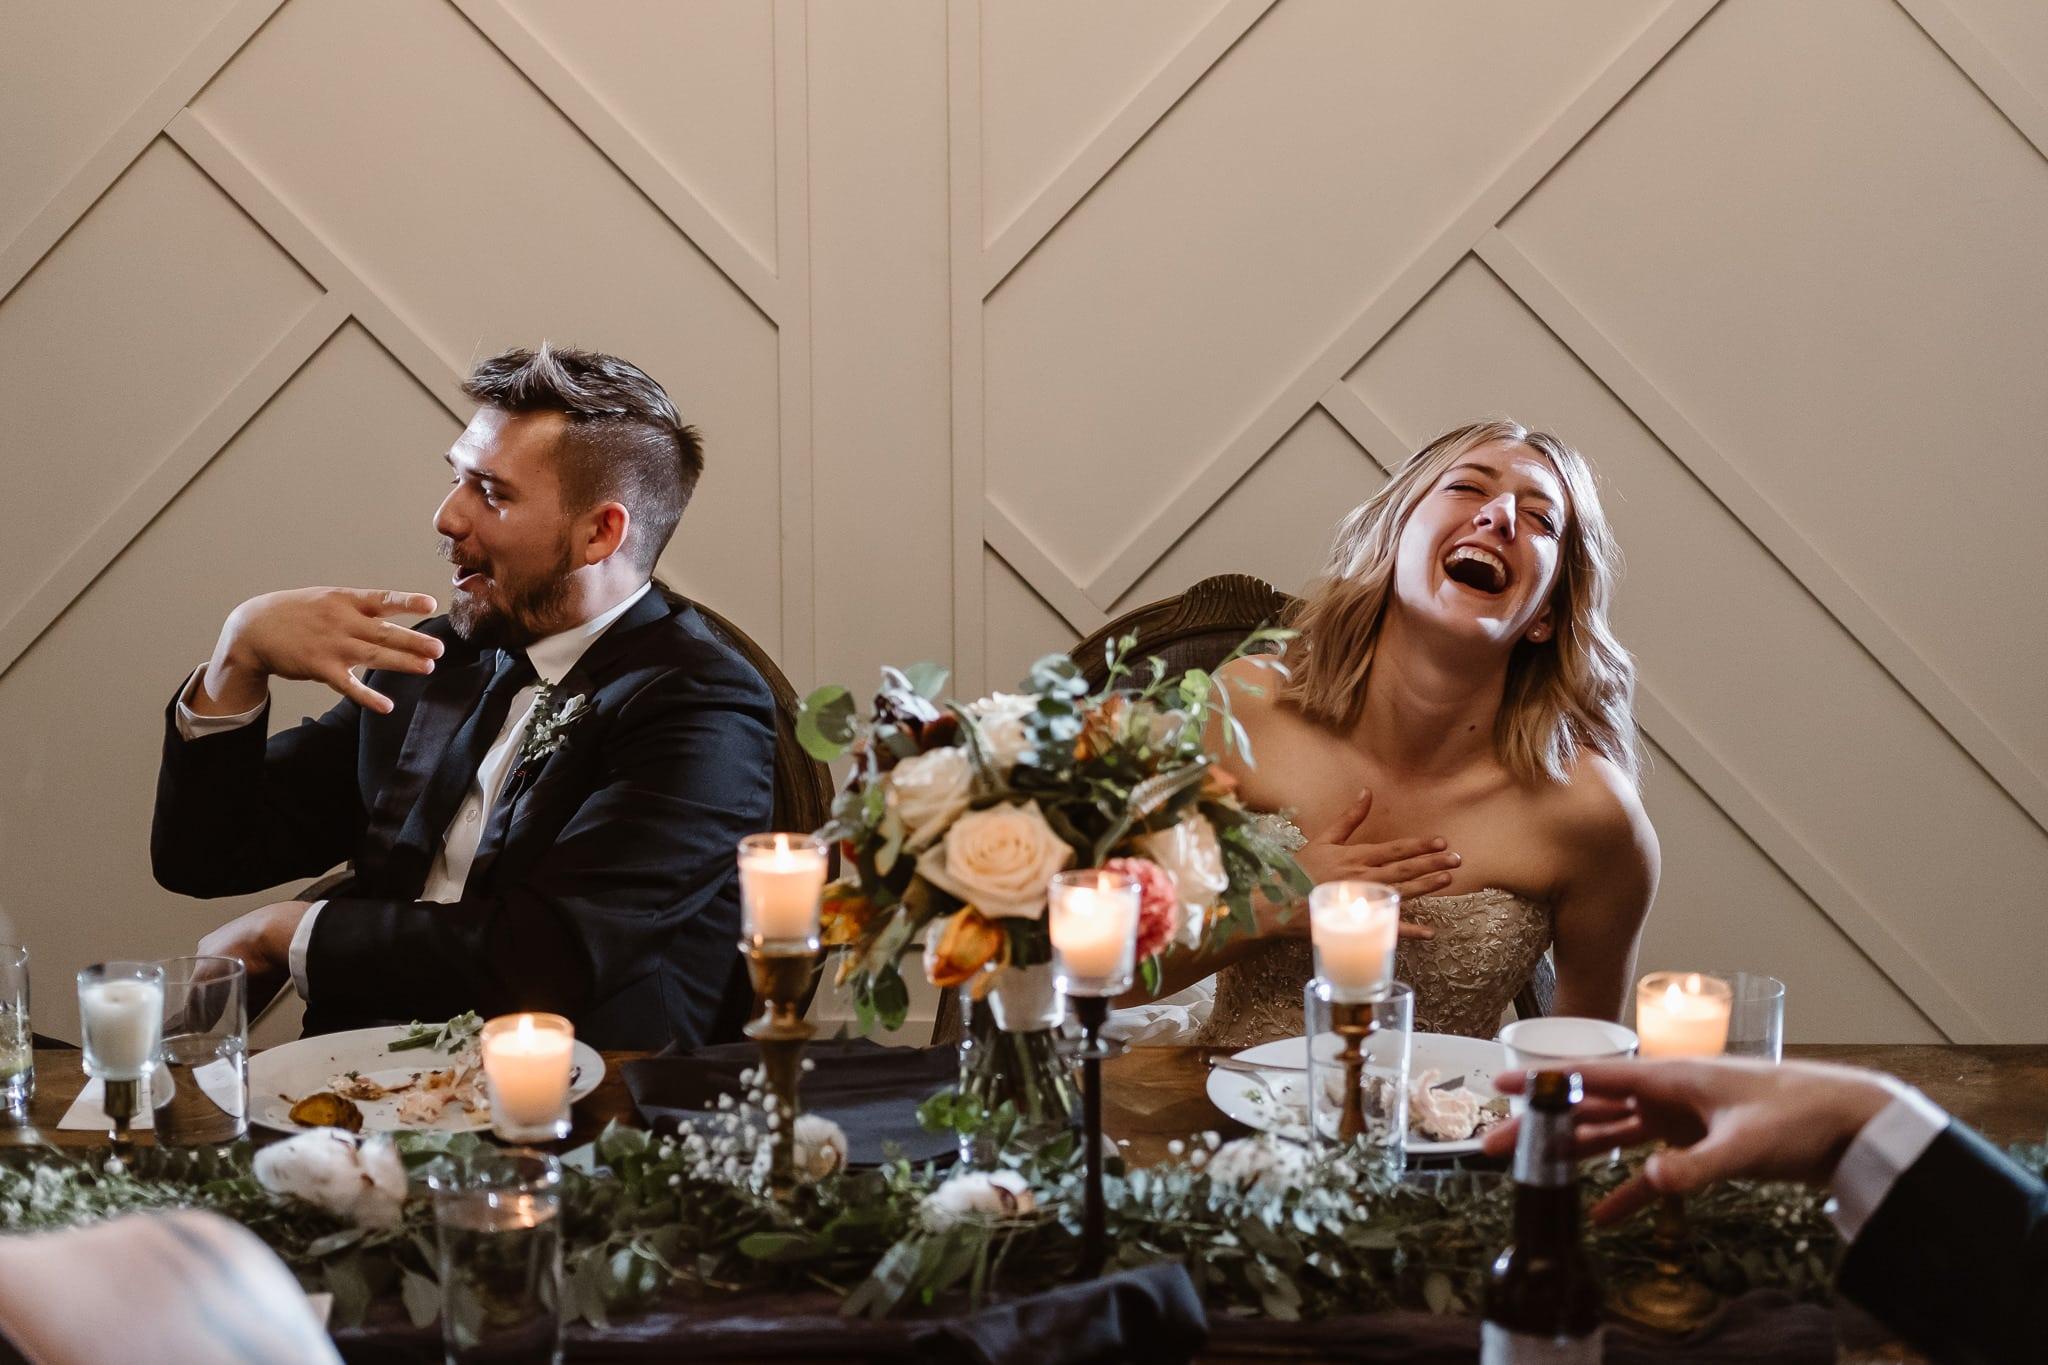 St Vrain Wedding Photographer   Longmont Wedding Photographer   Colorado Winter Wedding Photographer, Colorado industrial chic wedding ceremony, wedding toasts